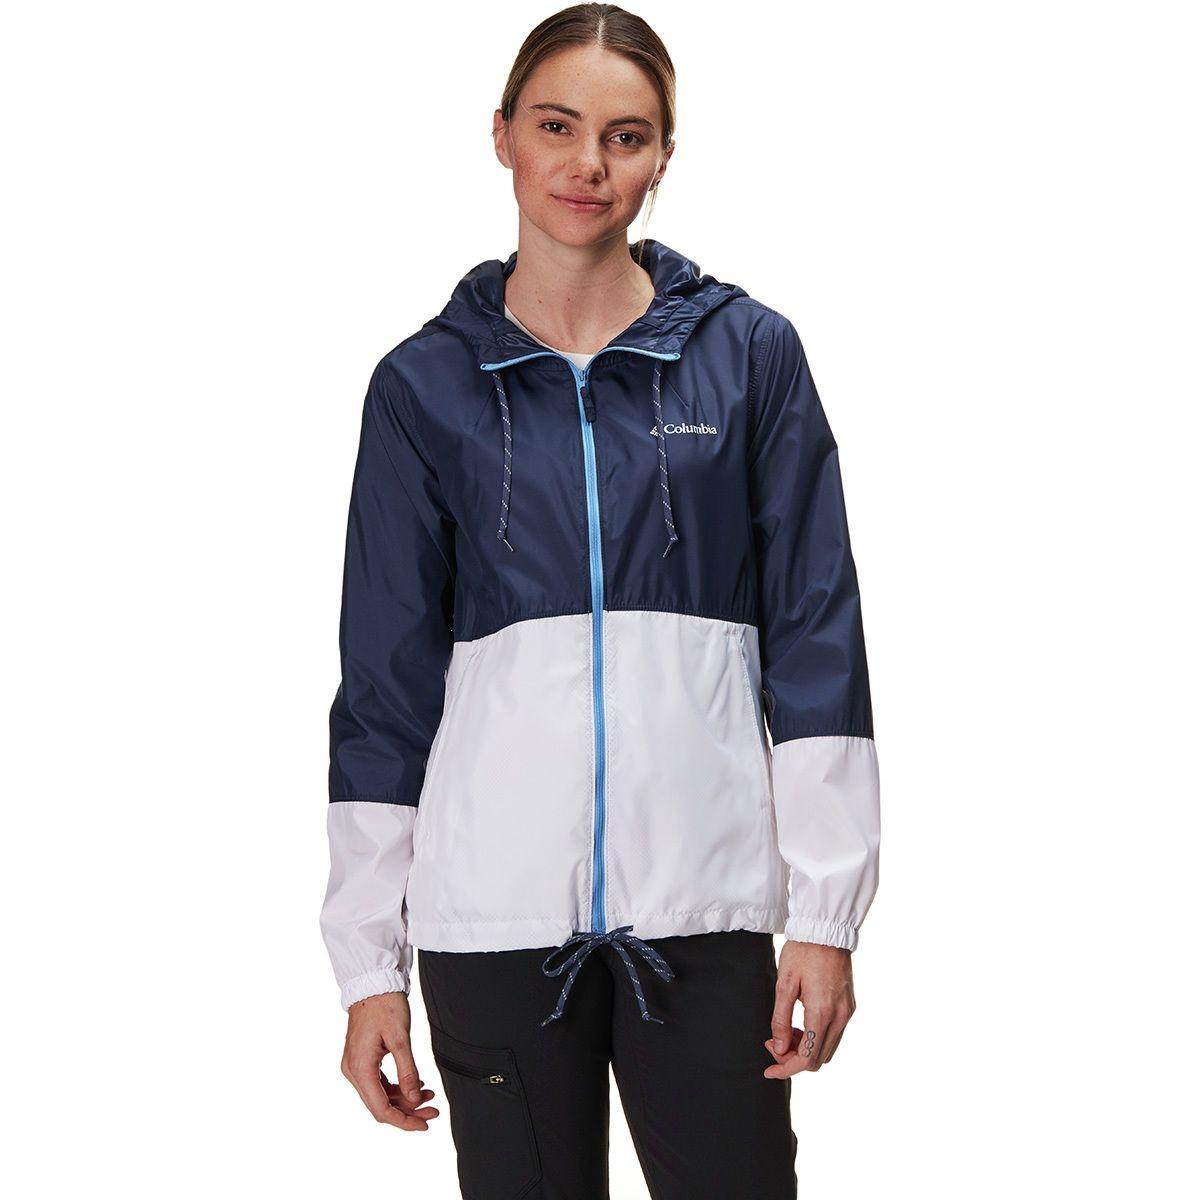 Women's Columbia Rain Jacket in Nocturnal / white